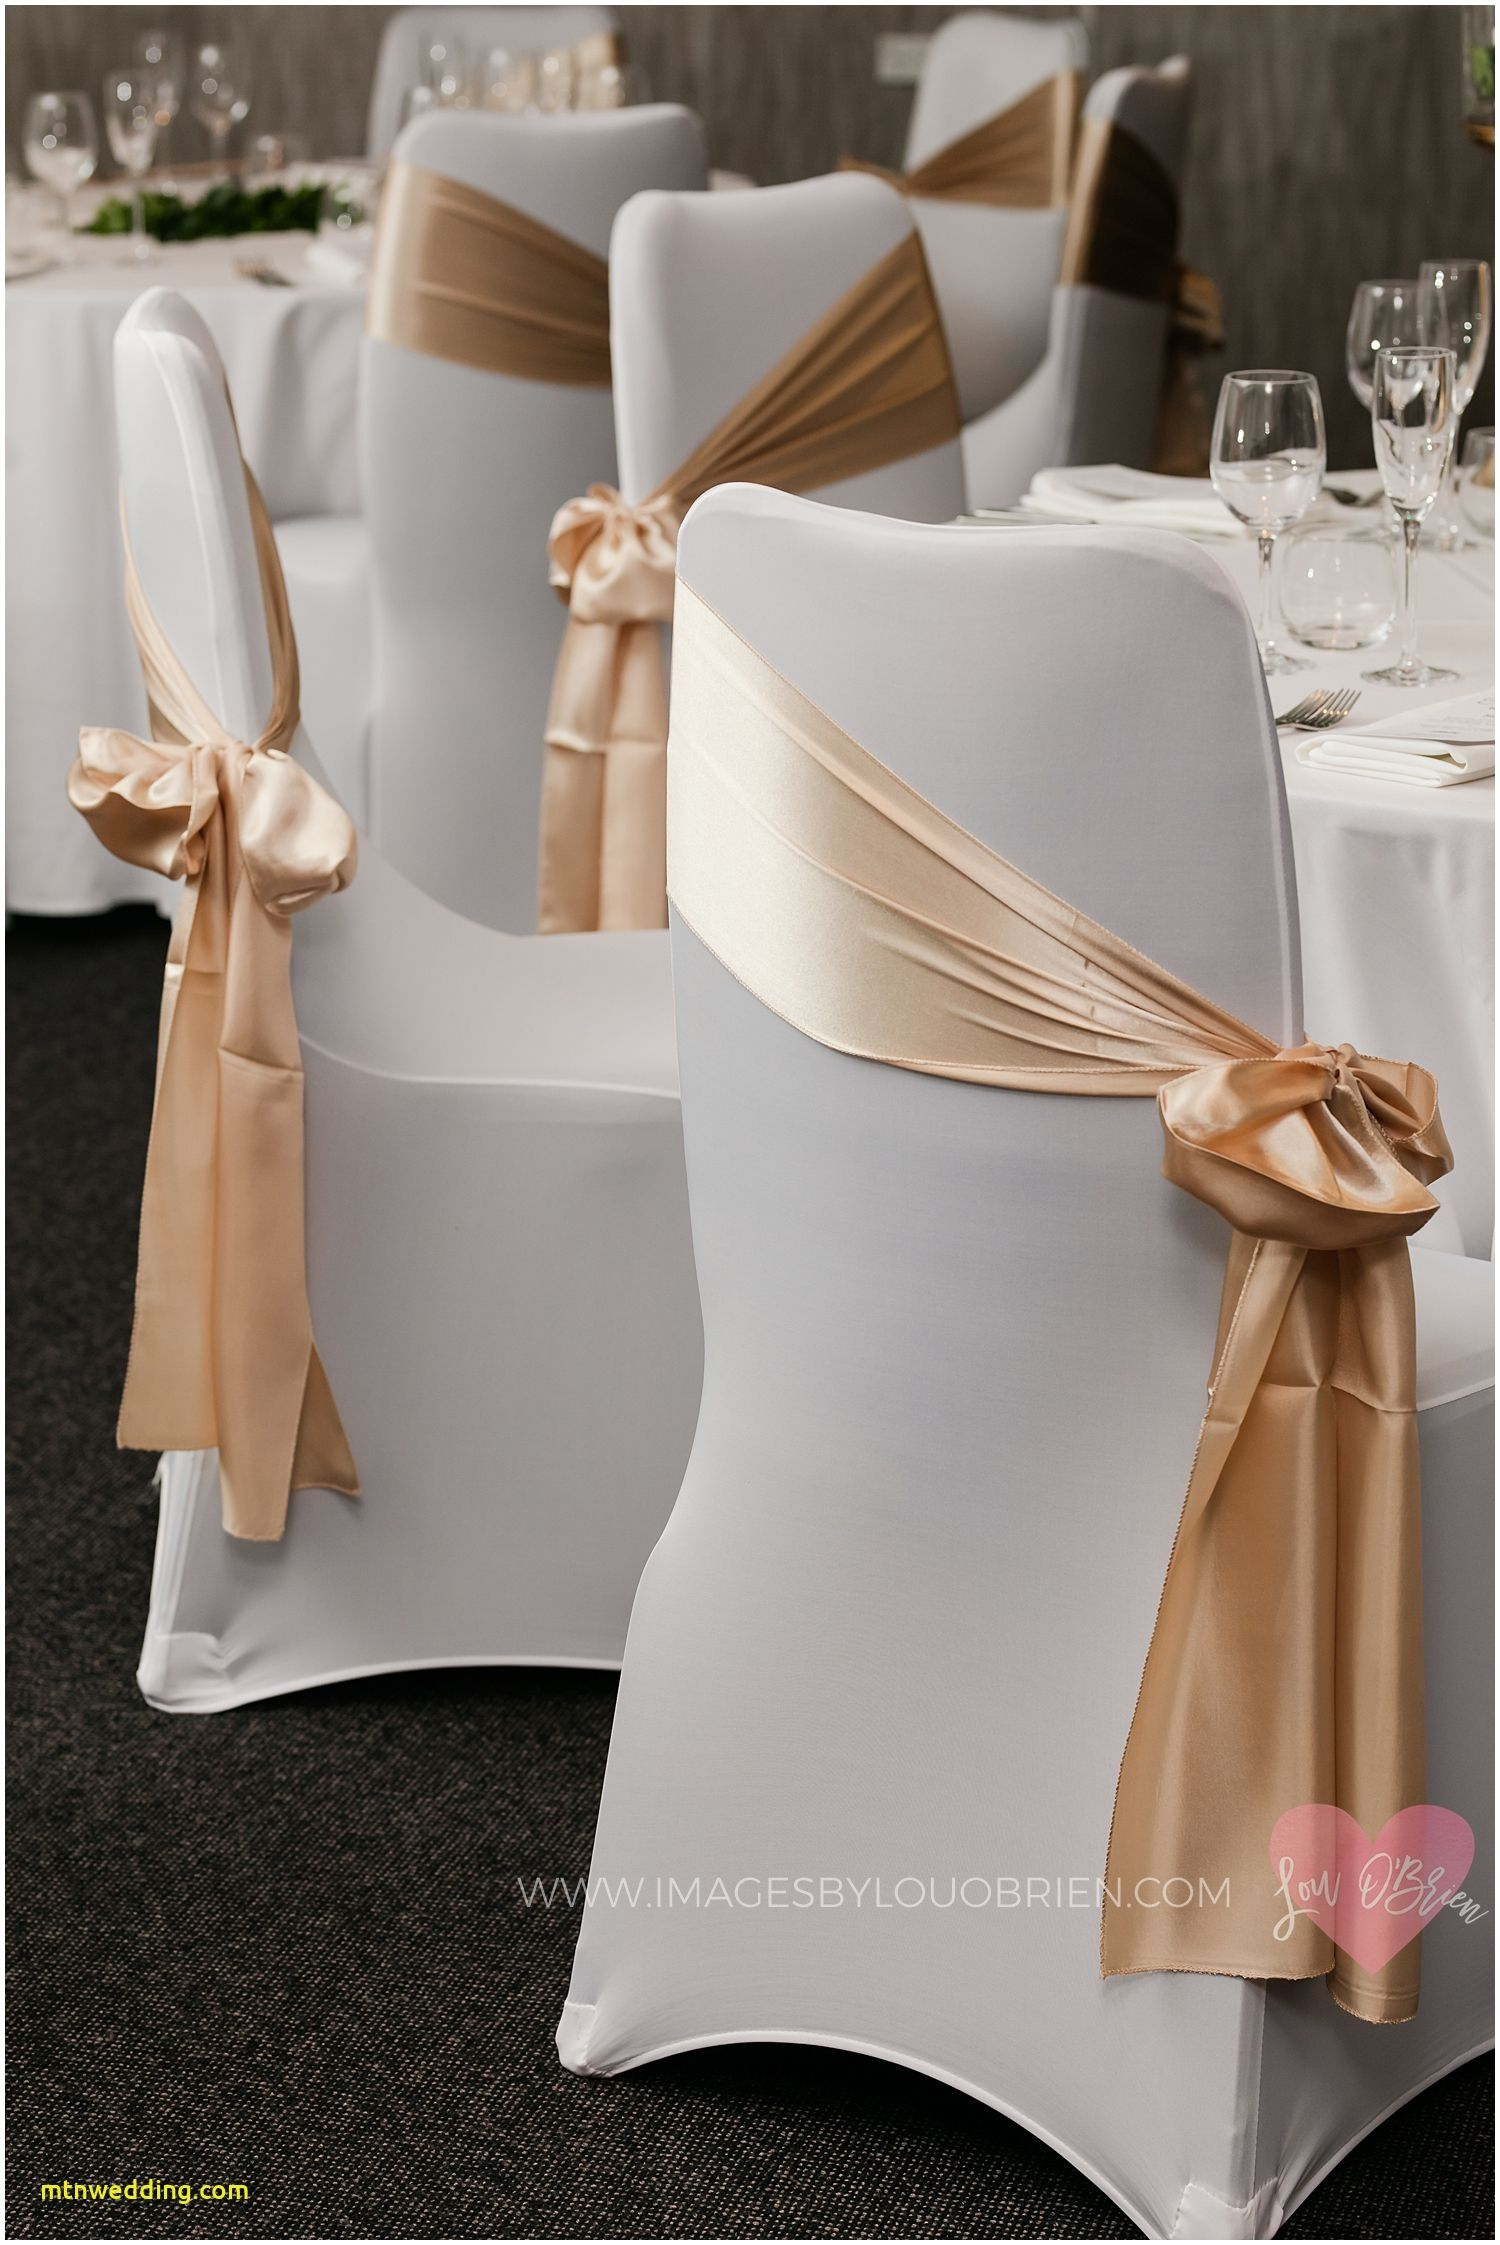 Inspirational Youtube Wedding Decorations Ideas Diy Wedding Chair Covers Wedding Chairs Diy Chair Covers Wedding